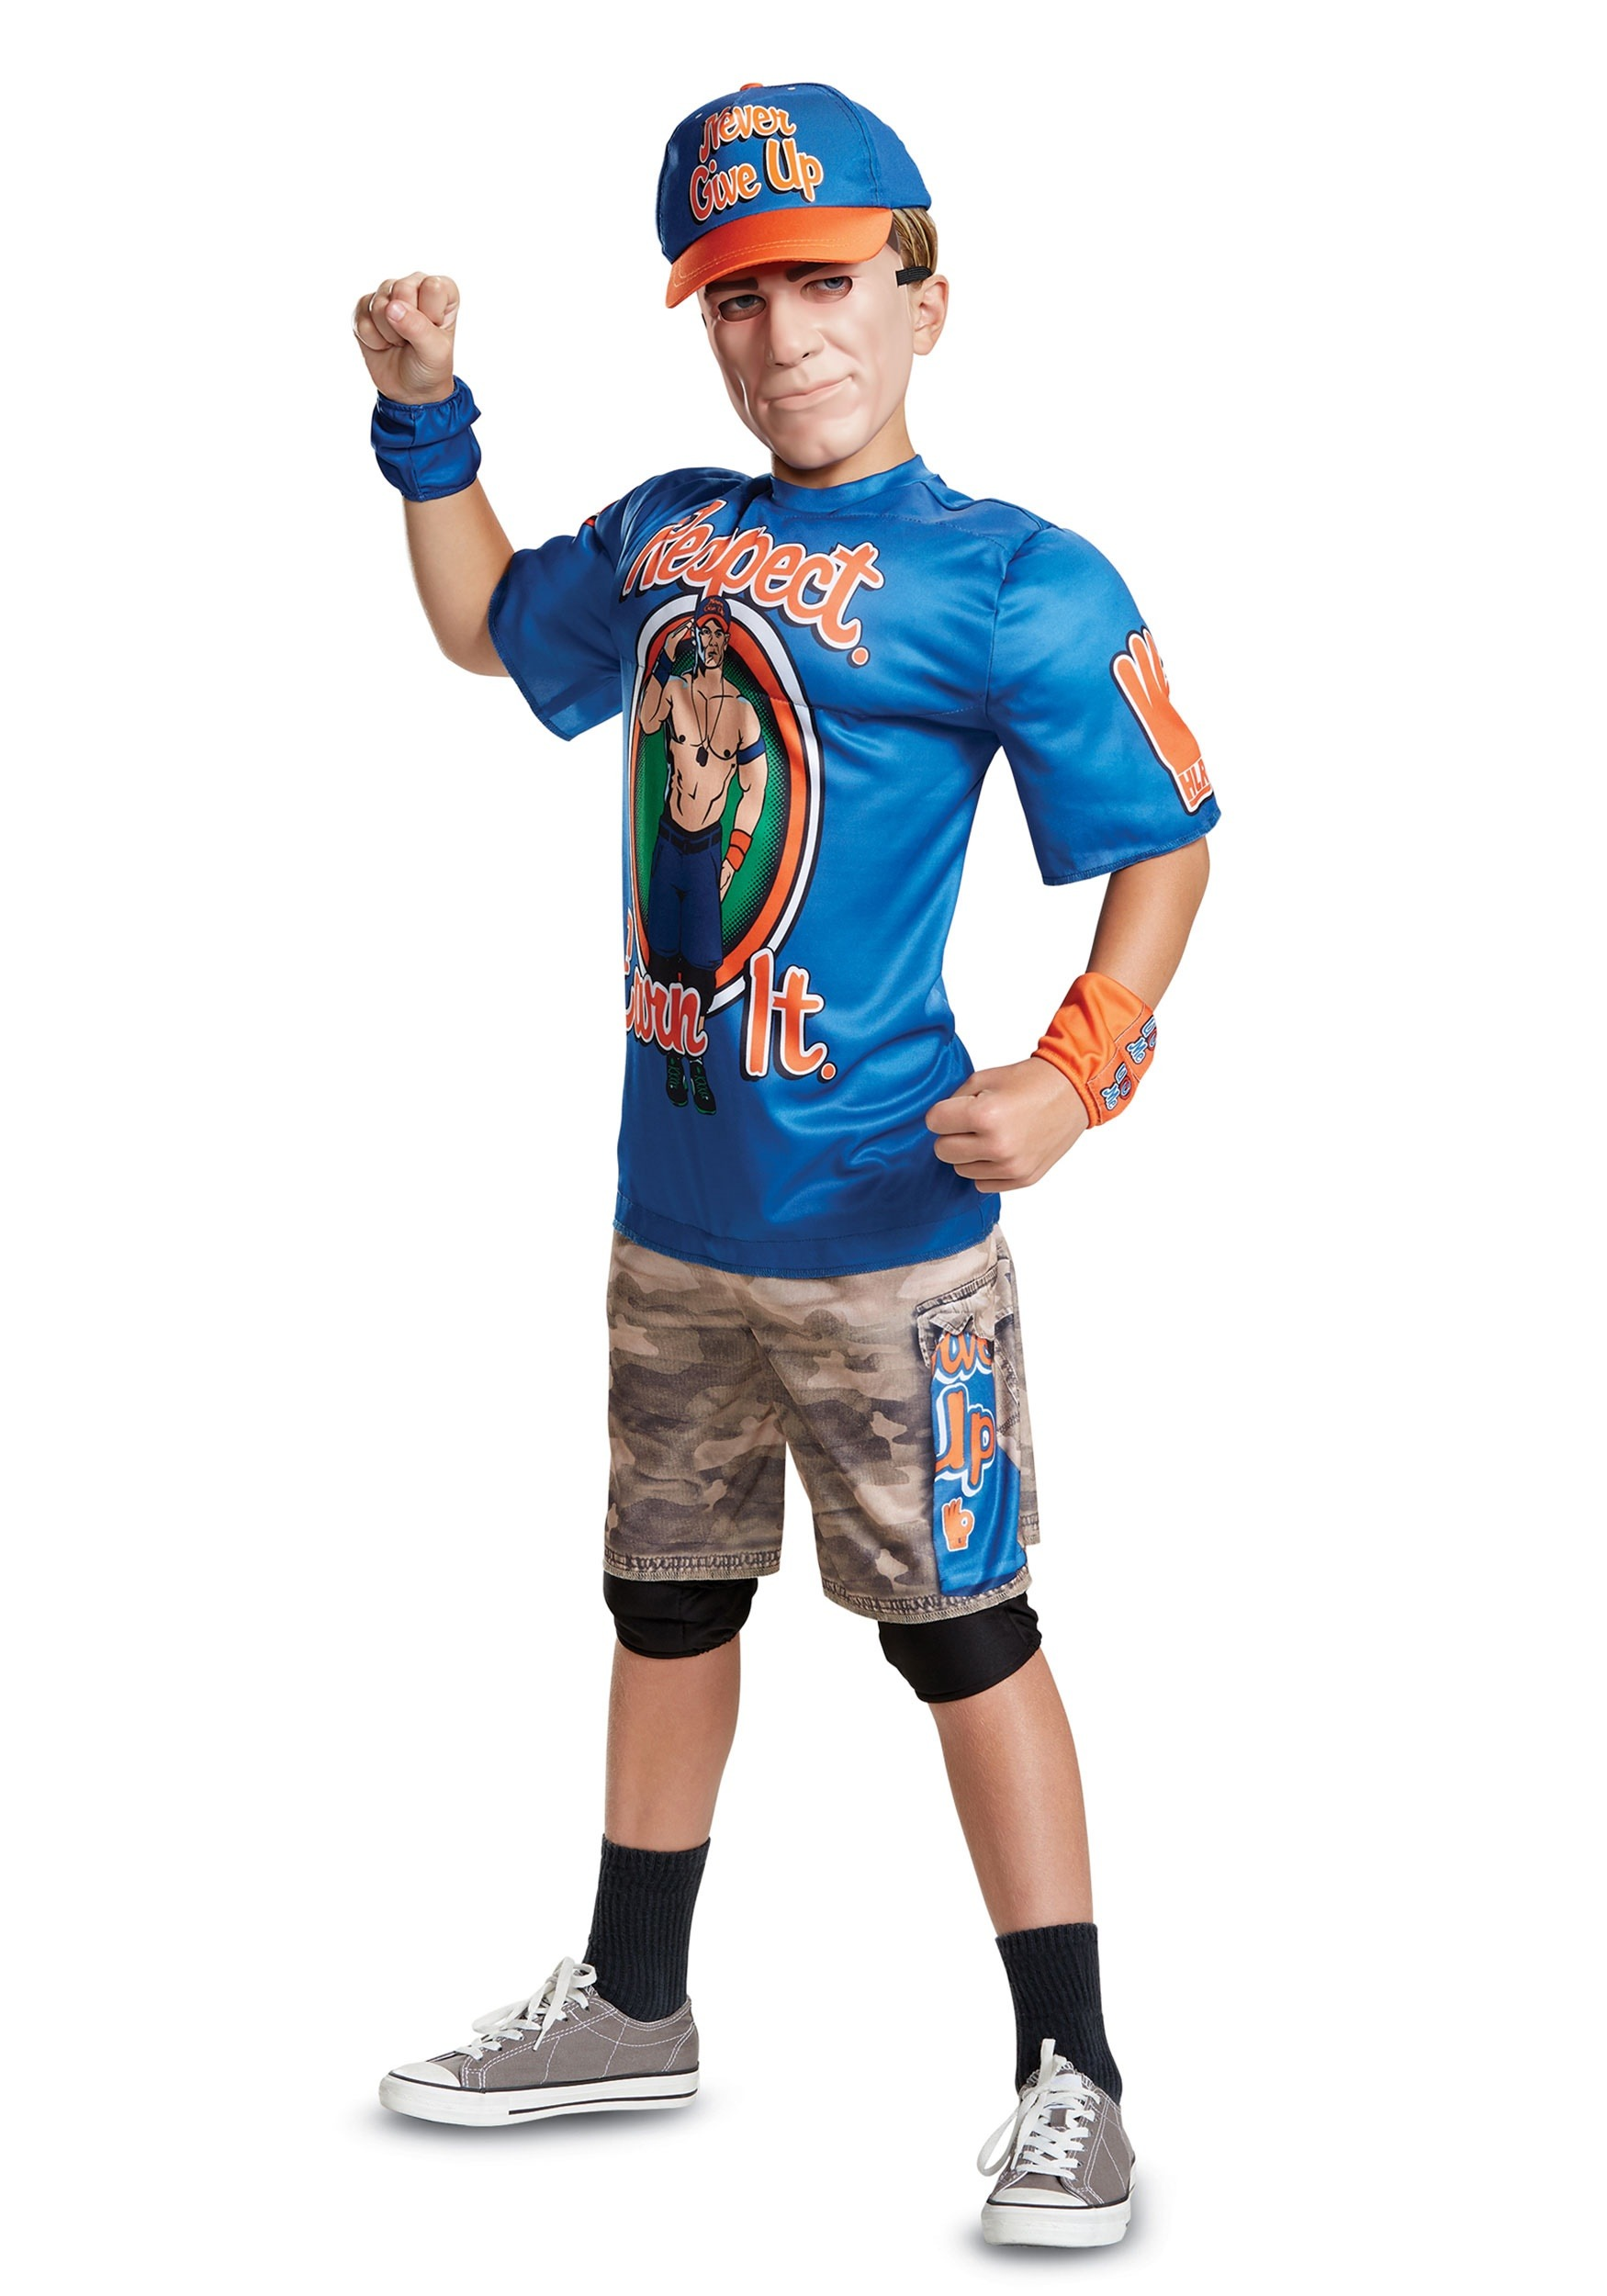 WWE John Cena Muscle Costume for Kids